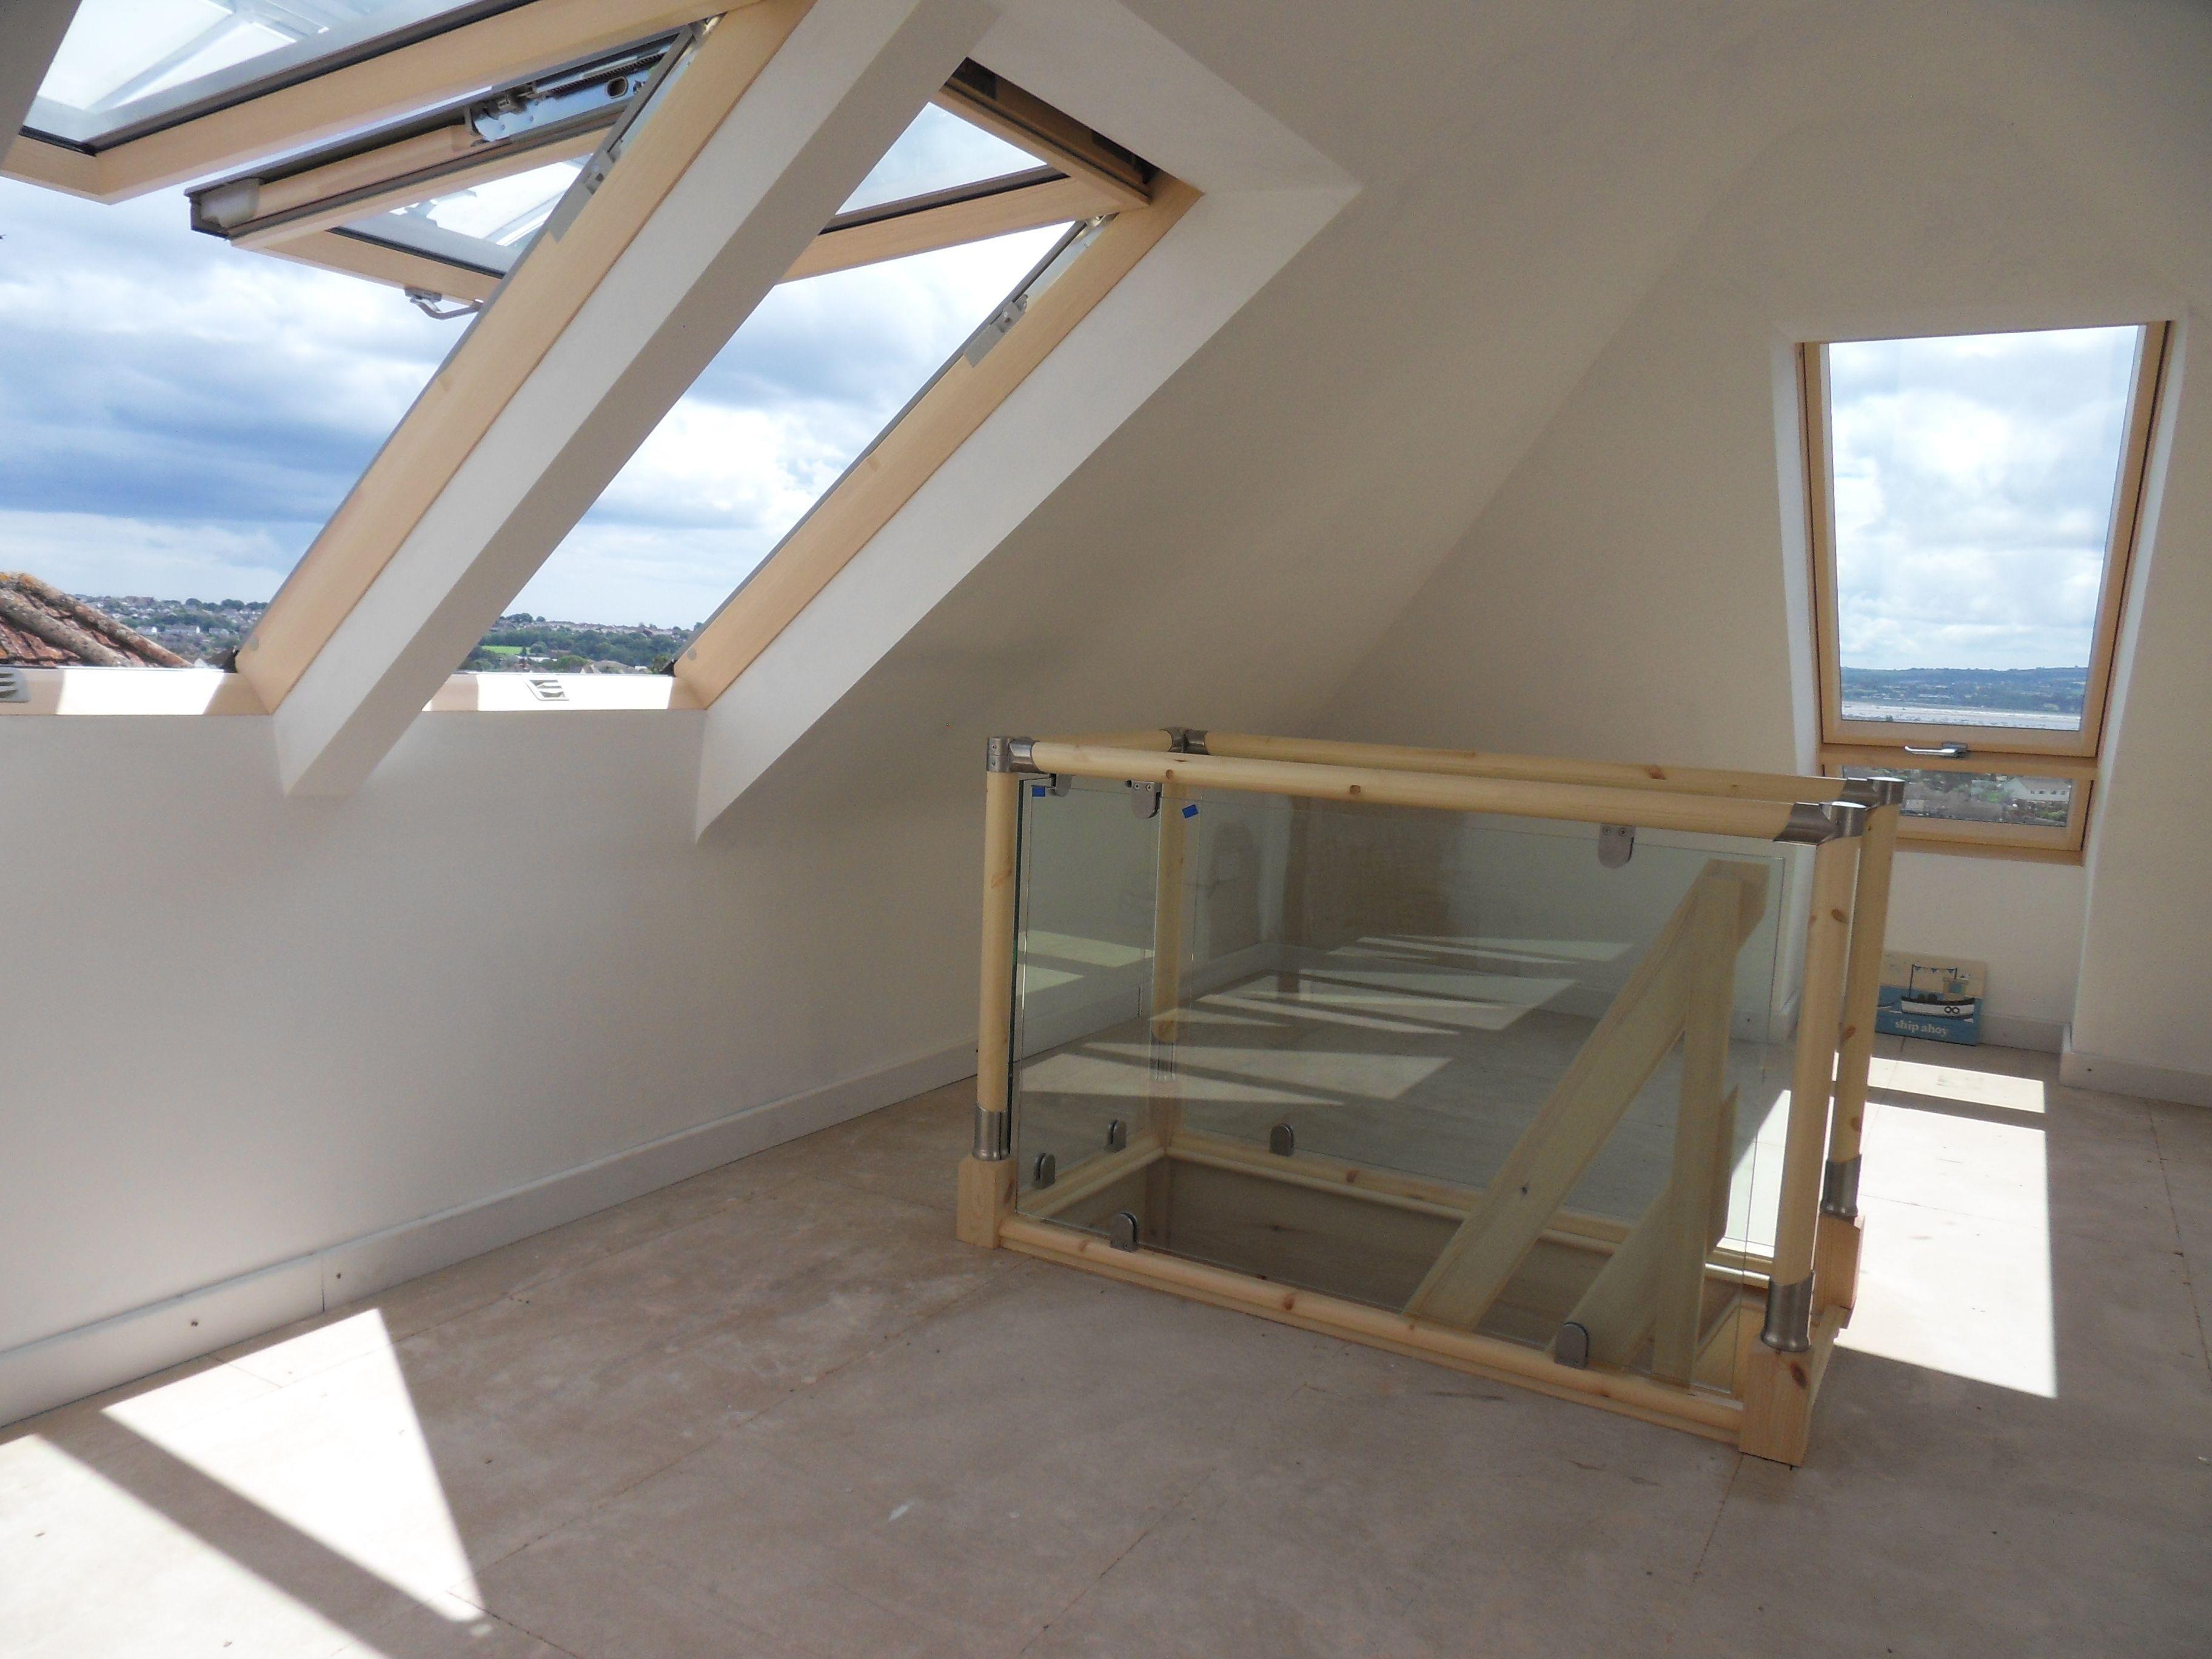 Loft bedroom wardrobe ideas  Easy And Cheap Cool Tips Attic Office Design attic door projects